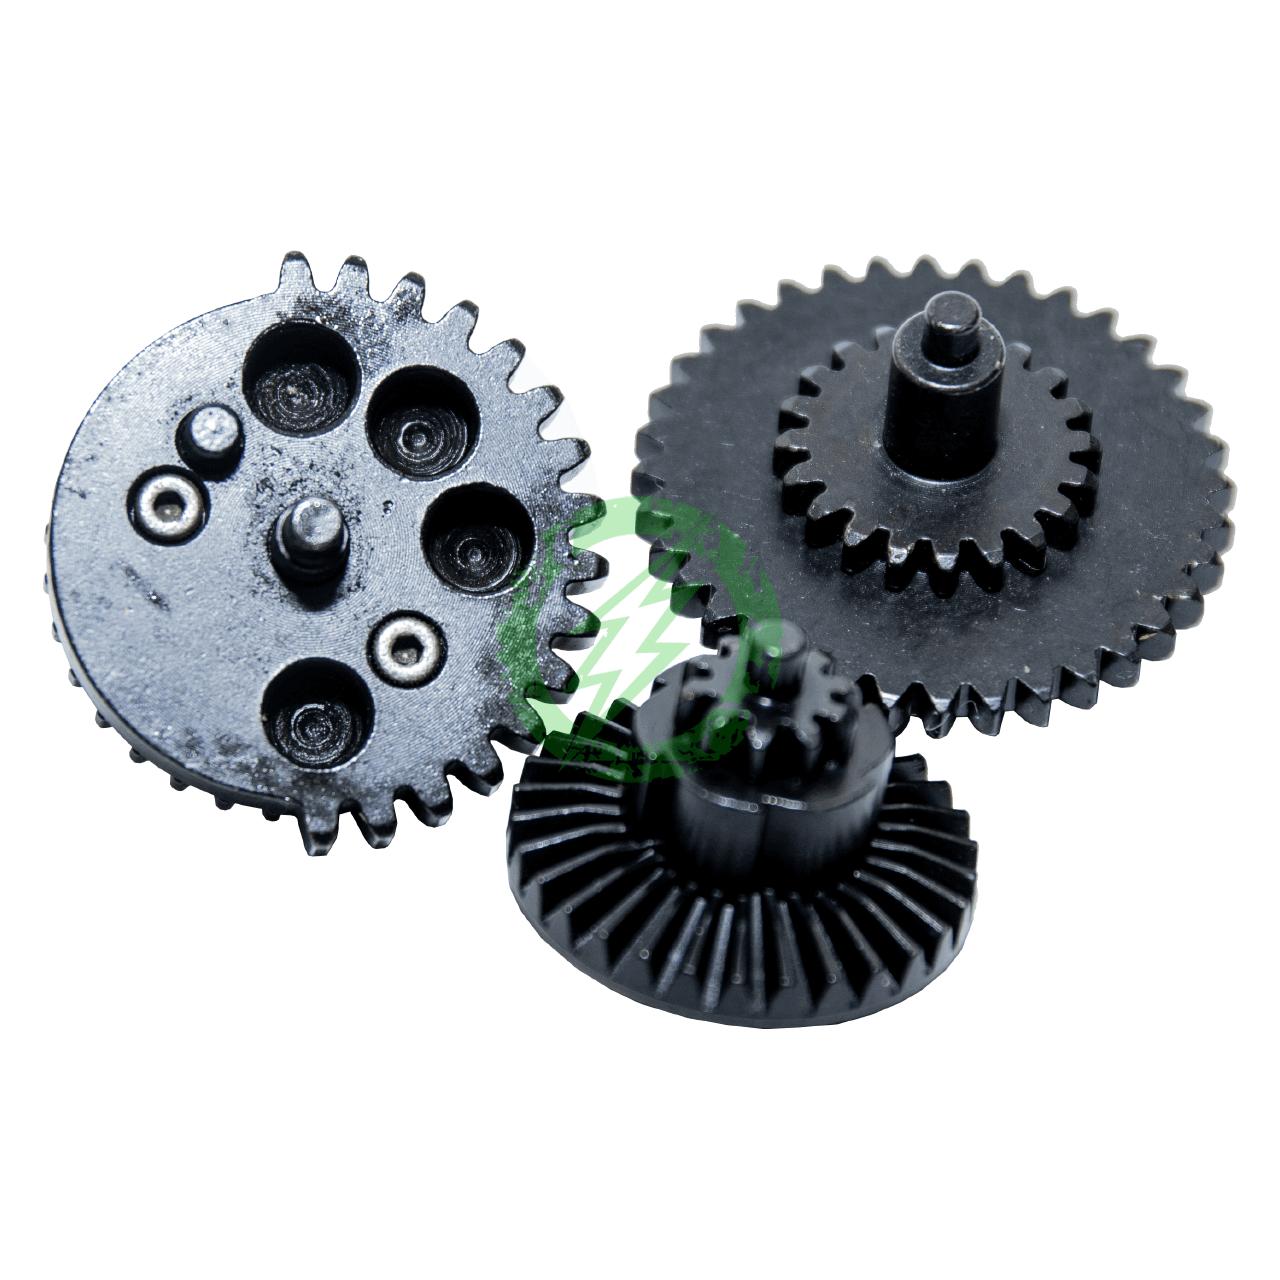 Rocket Airsoft CNC Gear Sets | 24:1